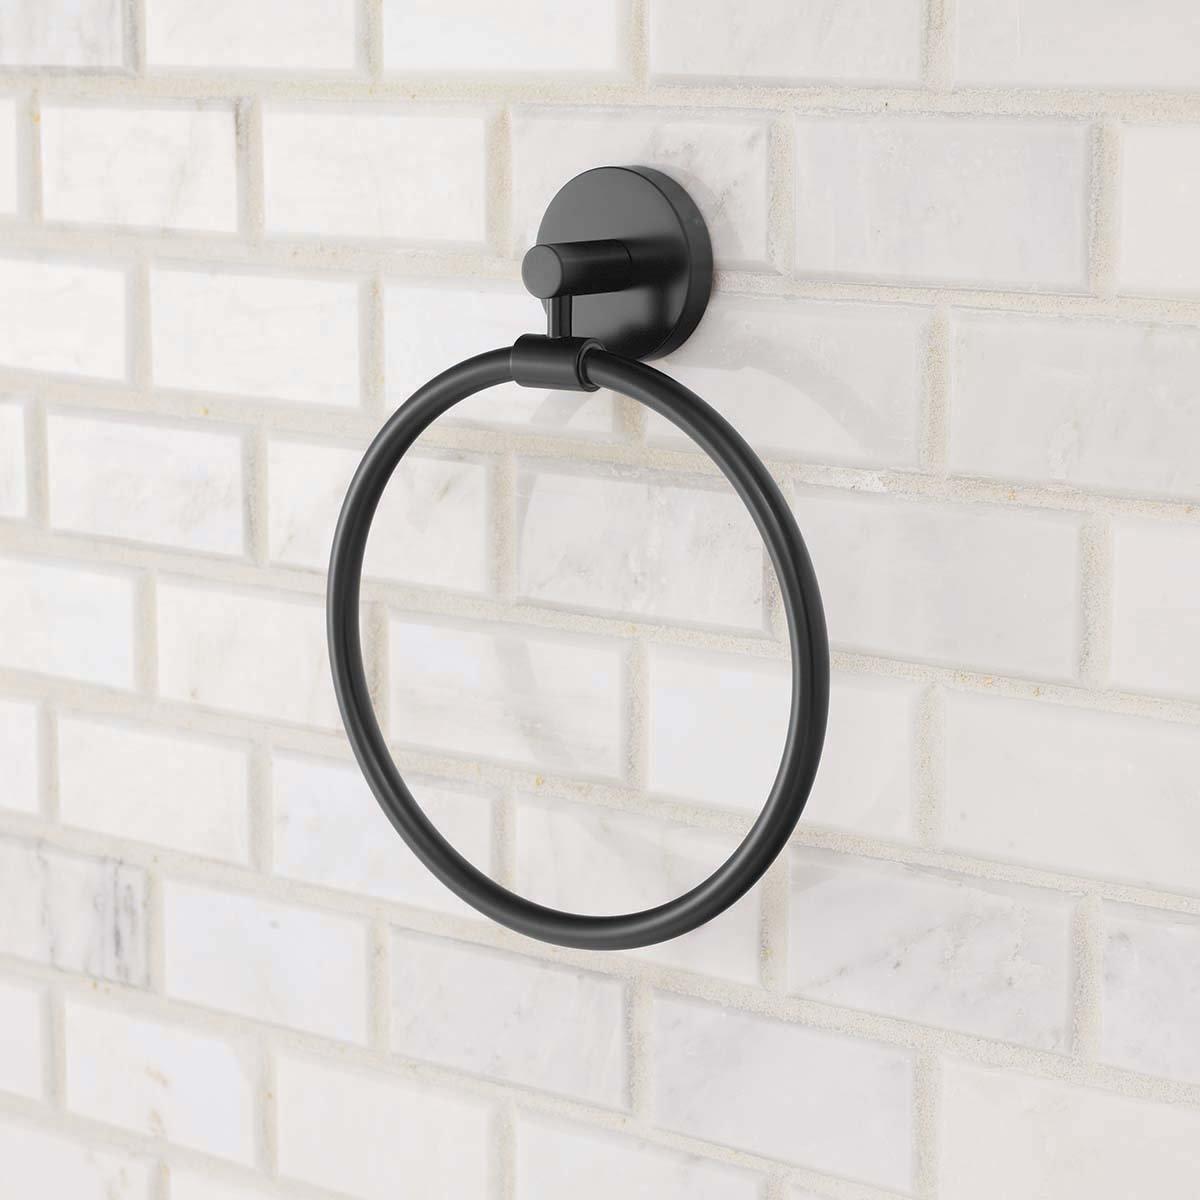 Speakman SA-2004-MB Neo Towel Ring, Matte Black by Speakman (Image #4)